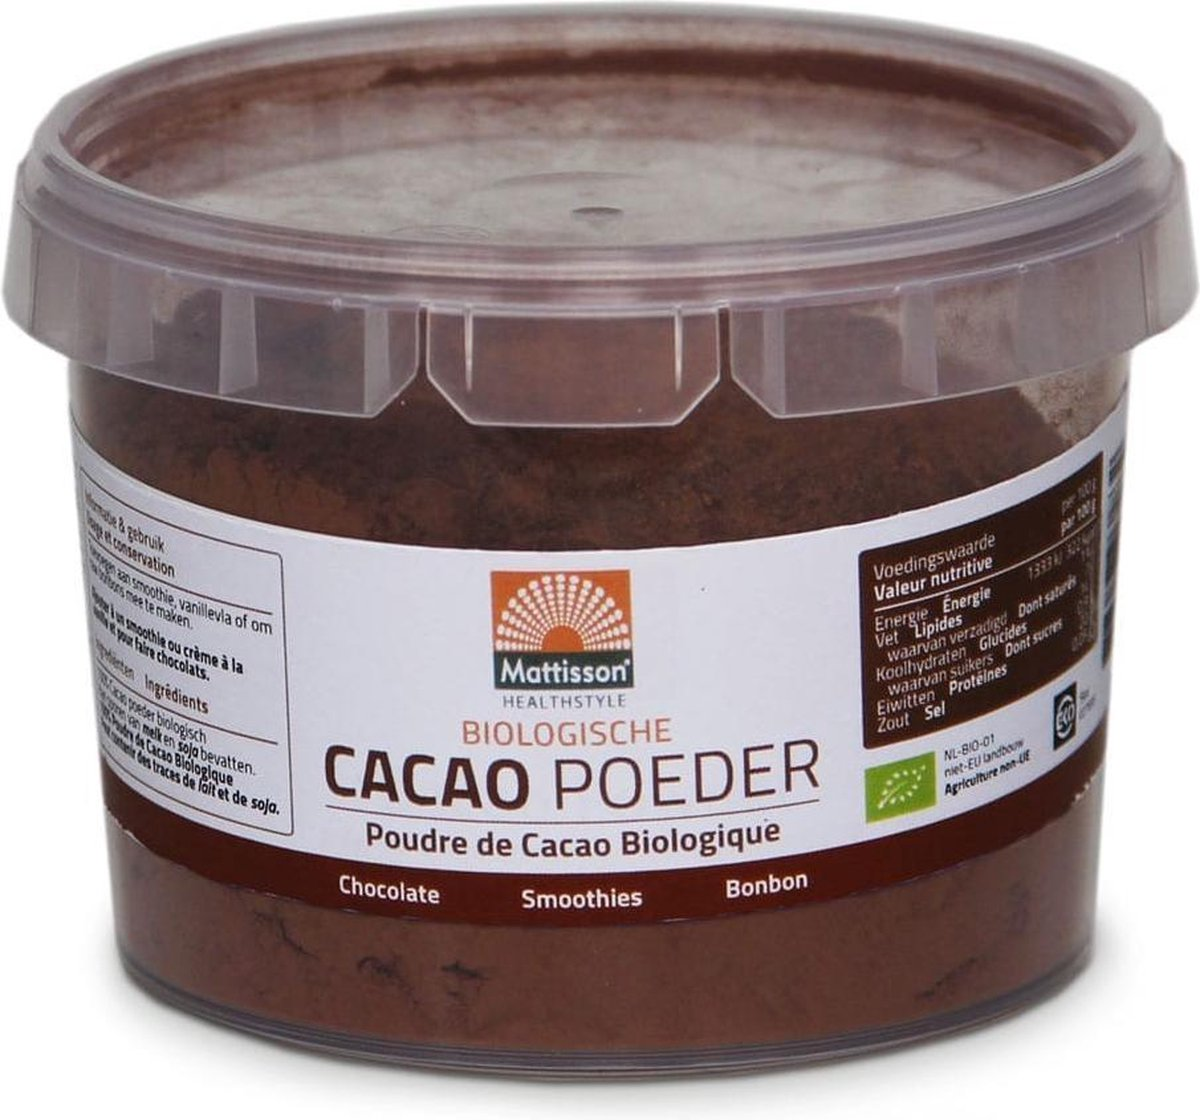 Mattisson Absolute Bio Cacao Poeder - 300 gram